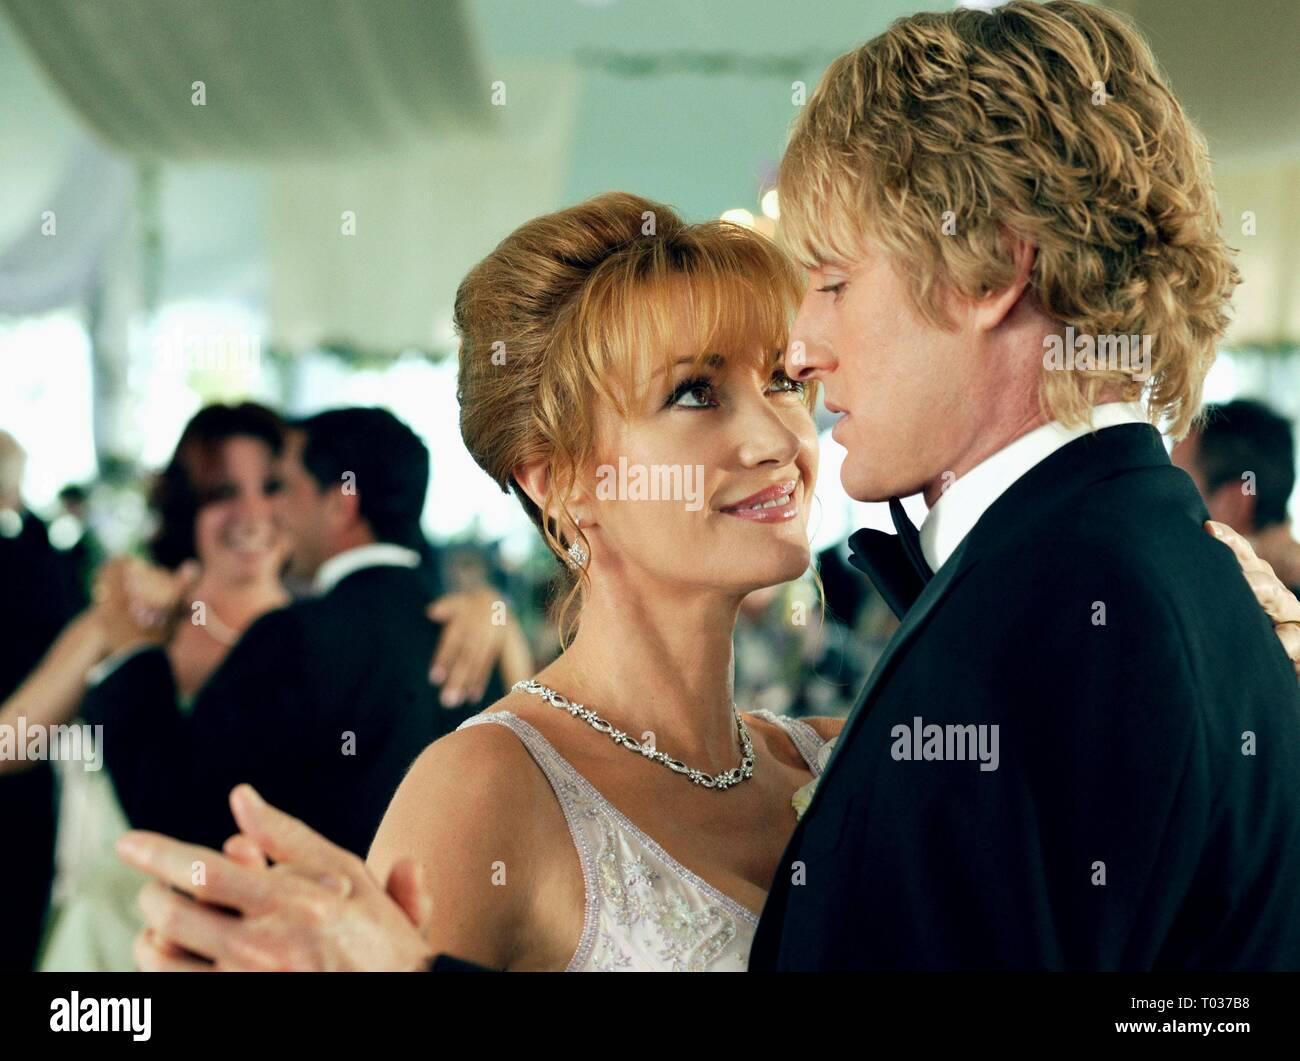 Jane Seymour Owen Wilson The Wedding Crashers 2005 Stock Photo Alamy